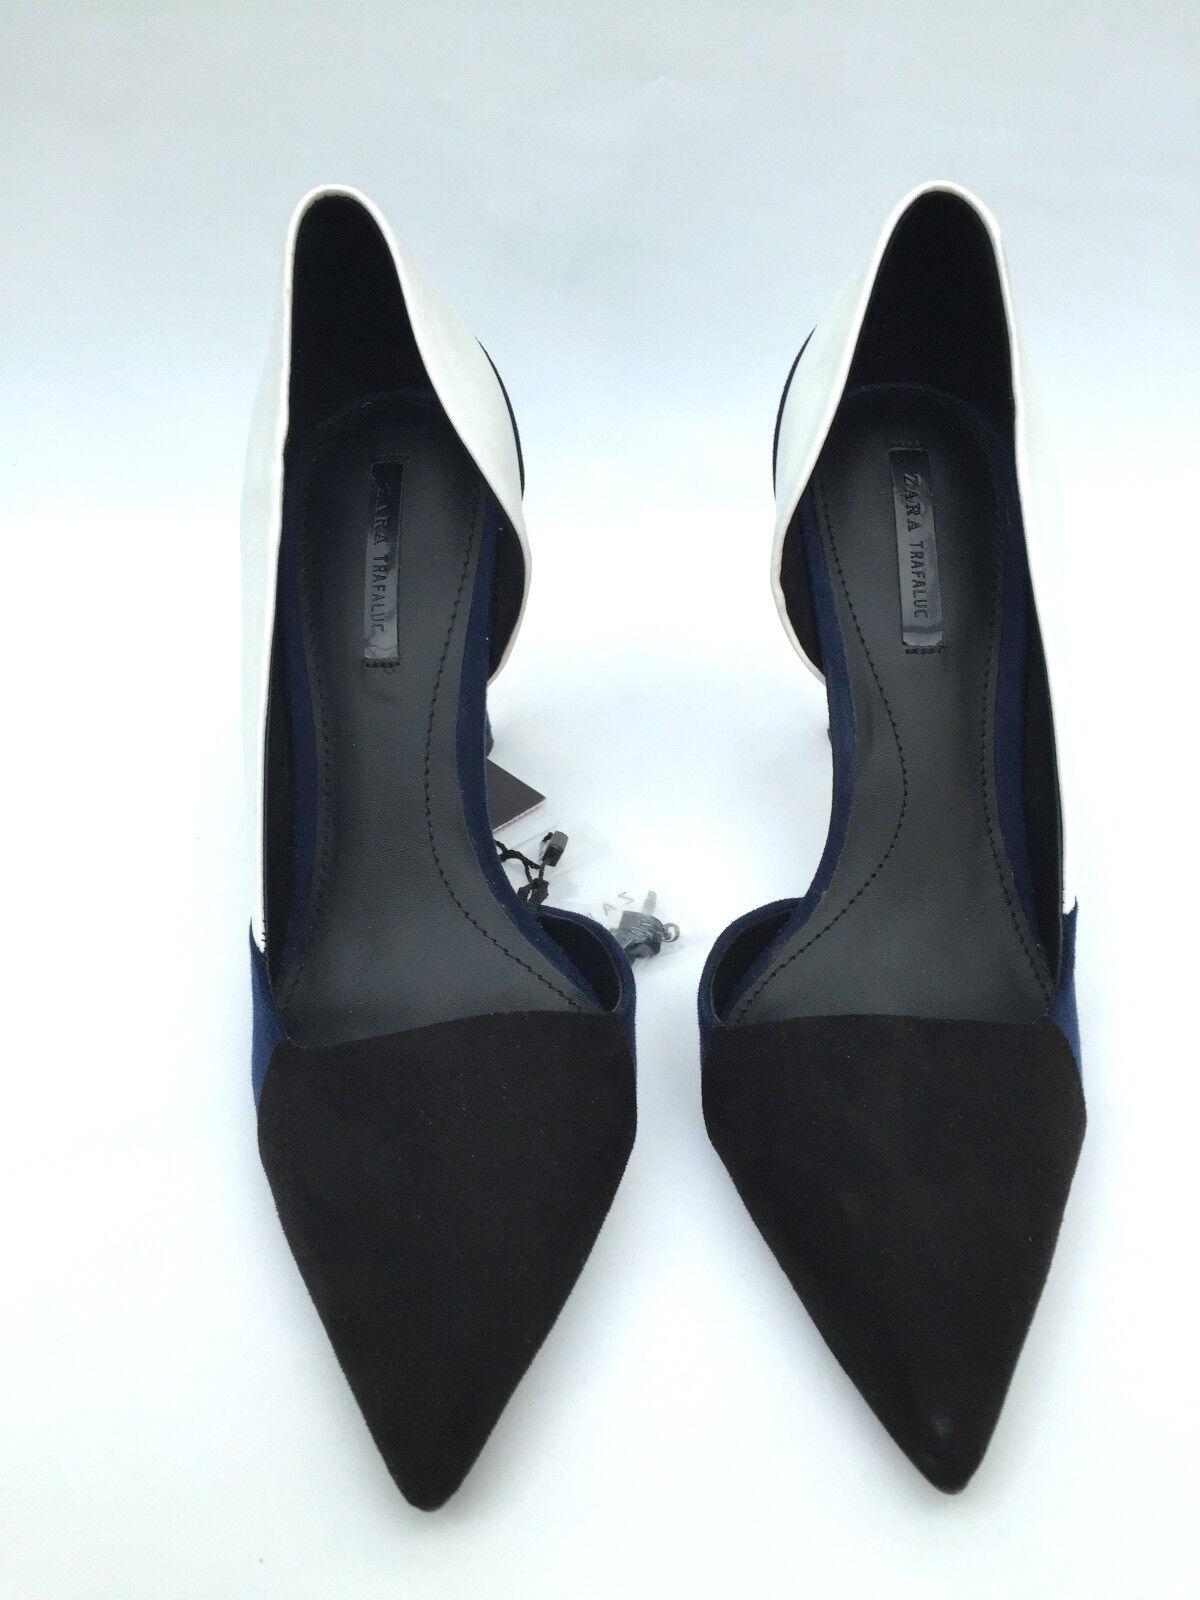 Zara Damen UK5 High Heels Pumps Größe UK5 Damen EUR38 Us Us7.5 c58b39